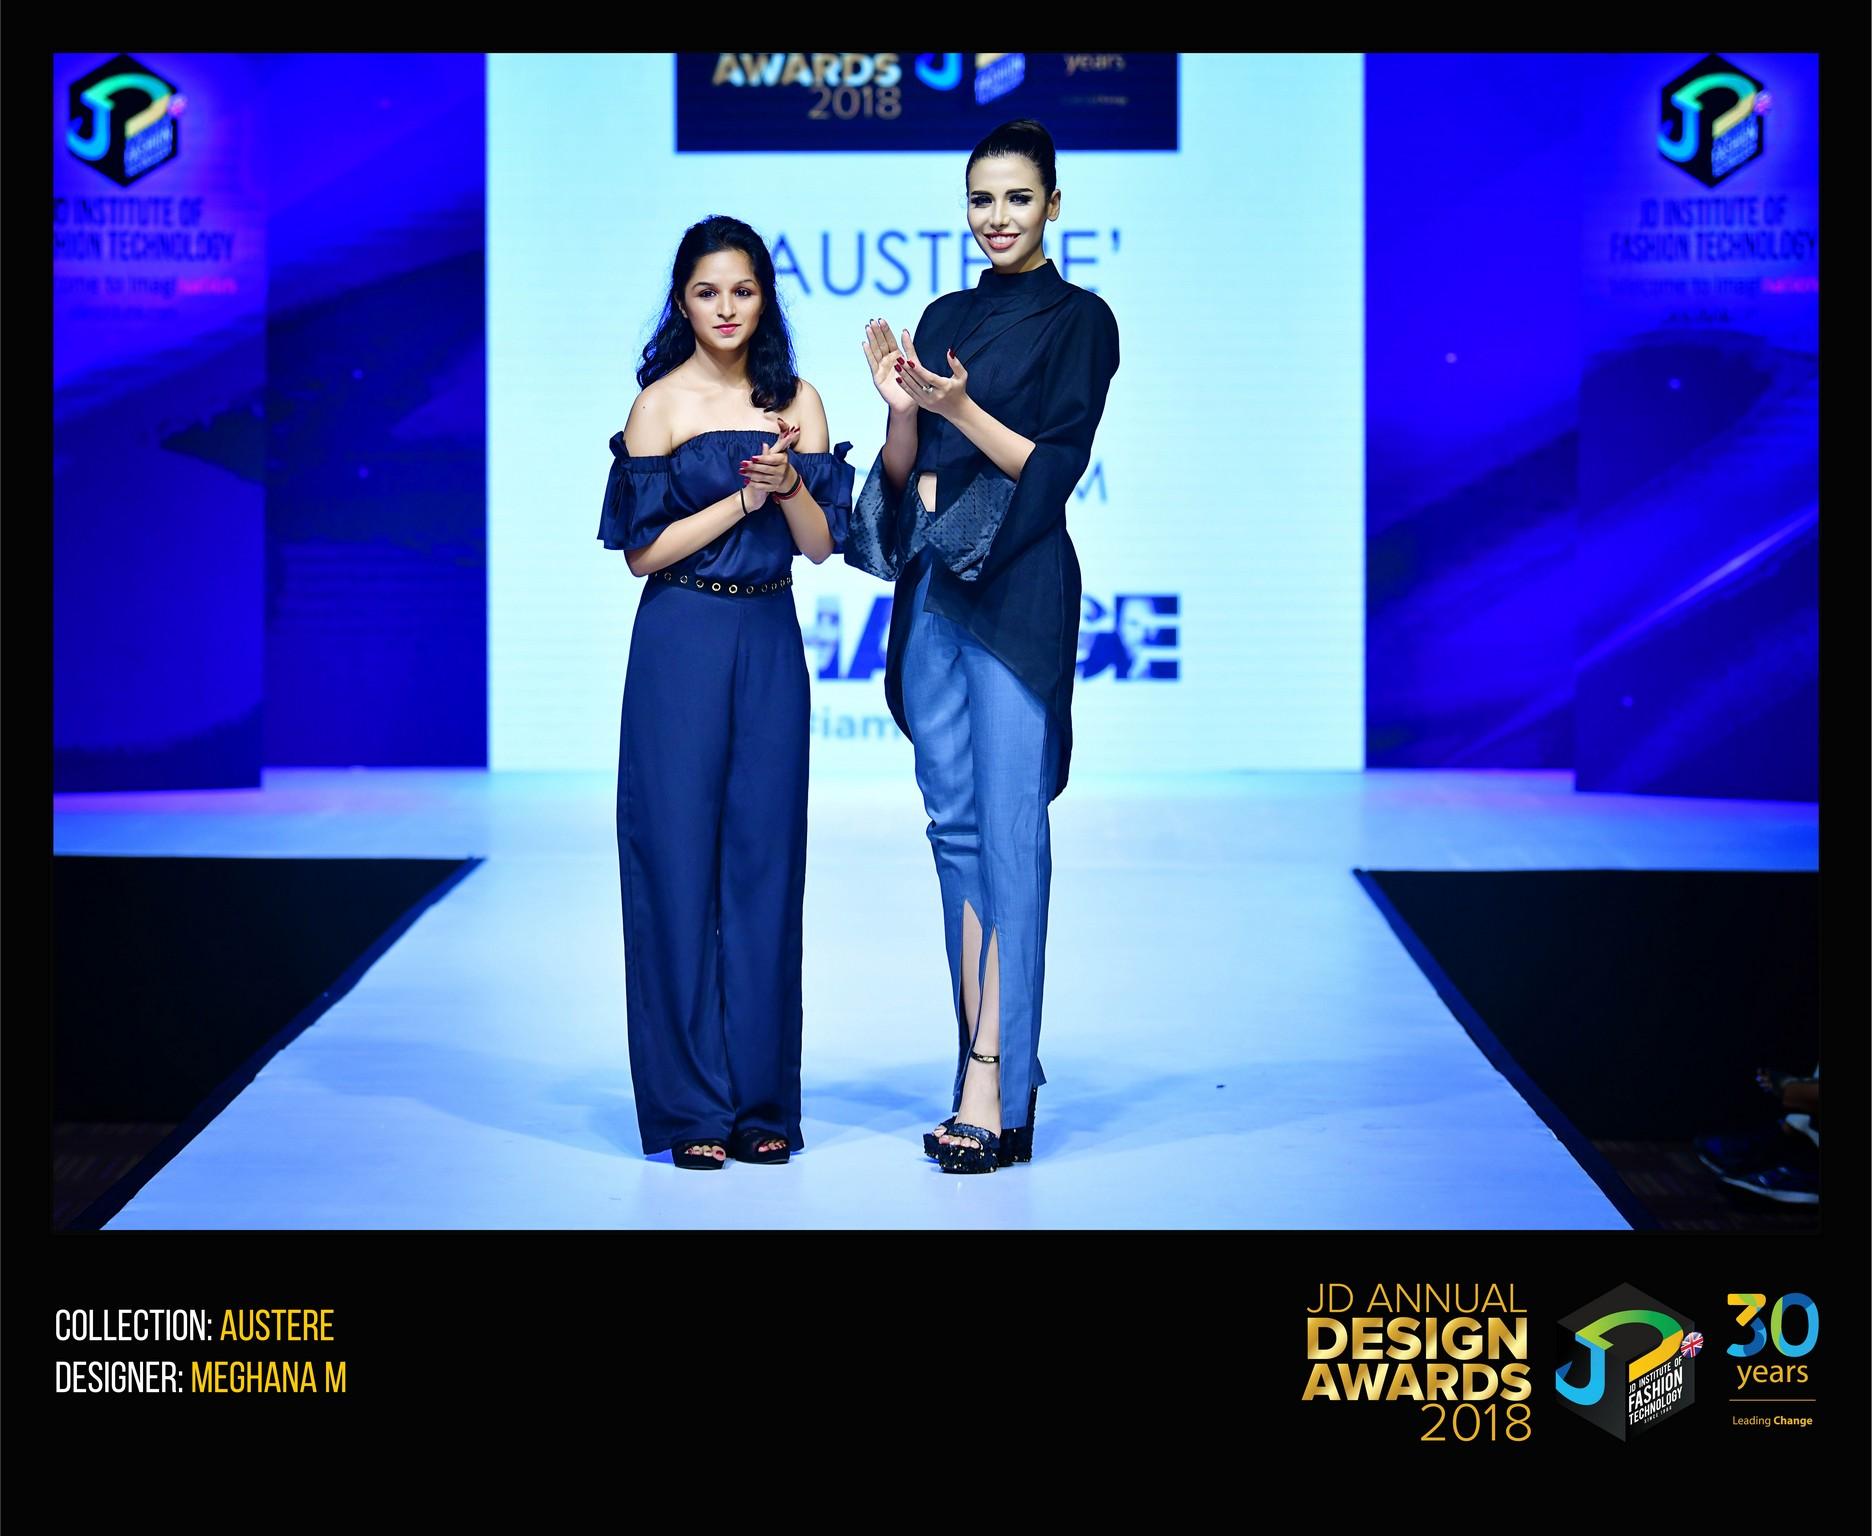 Austere – Change – JD Annual Design Awards 2018   Designer: Meghana   Photography : Jerin Nath (@jerin_nath) austere - AUSTERE9 final - Austere – Change – JD Annual Design Awards 2018